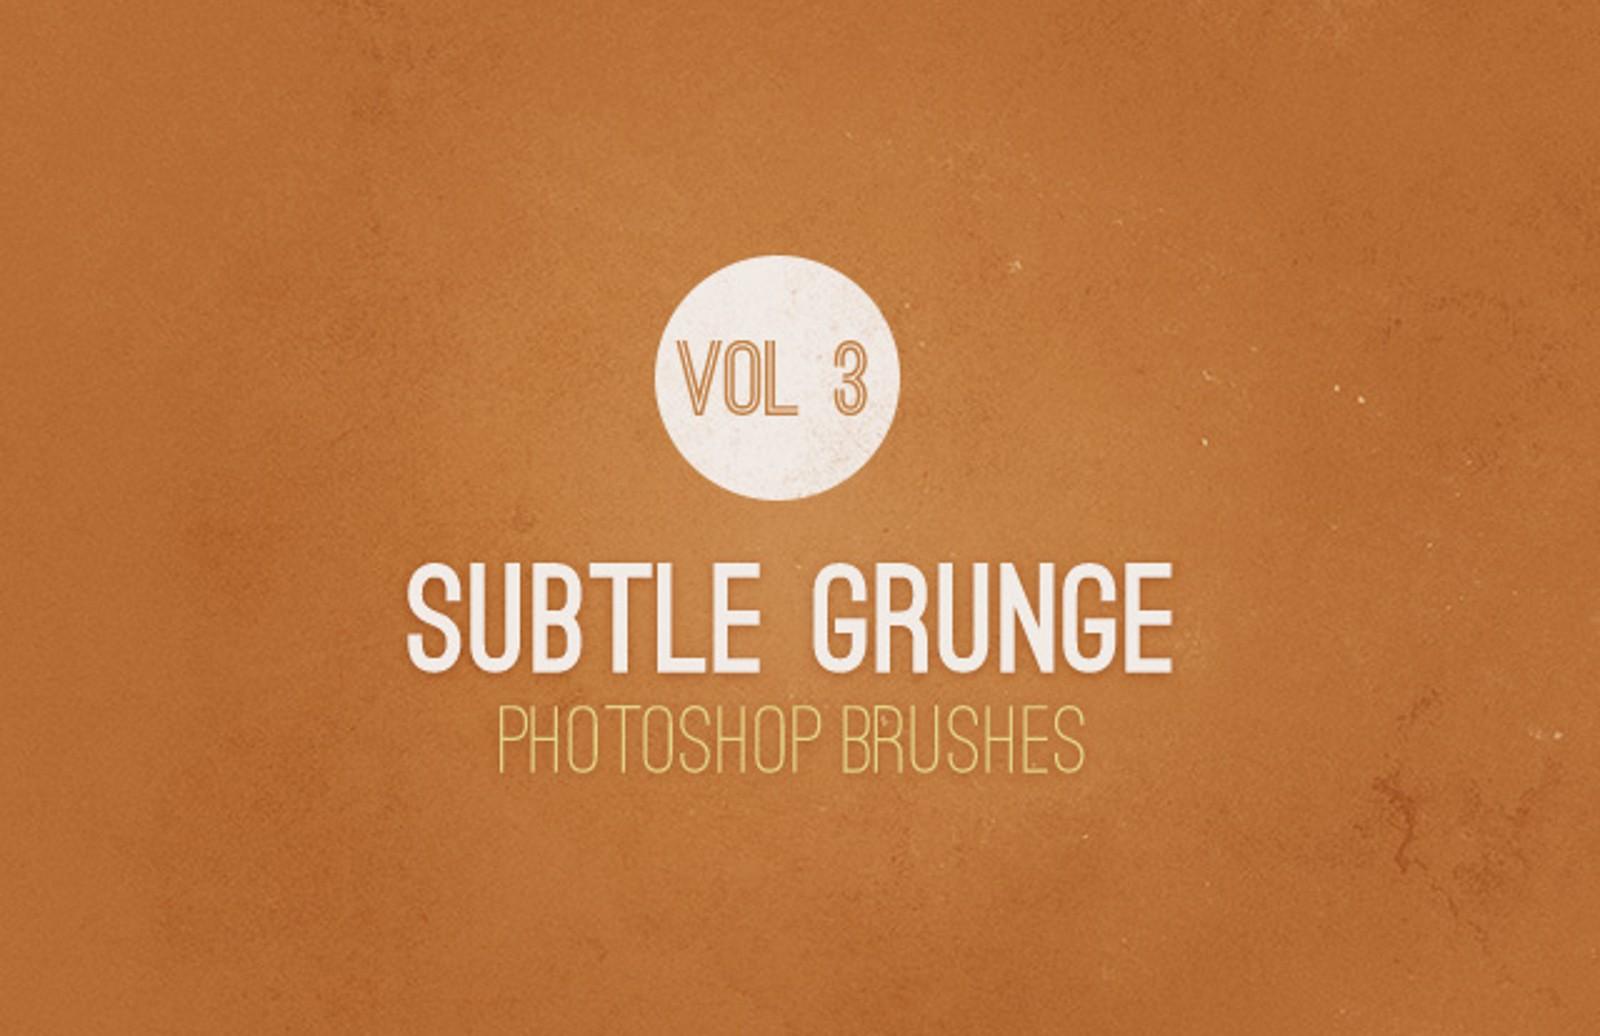 Subtle  Grunge  Brushes  Vol 3  Preview1